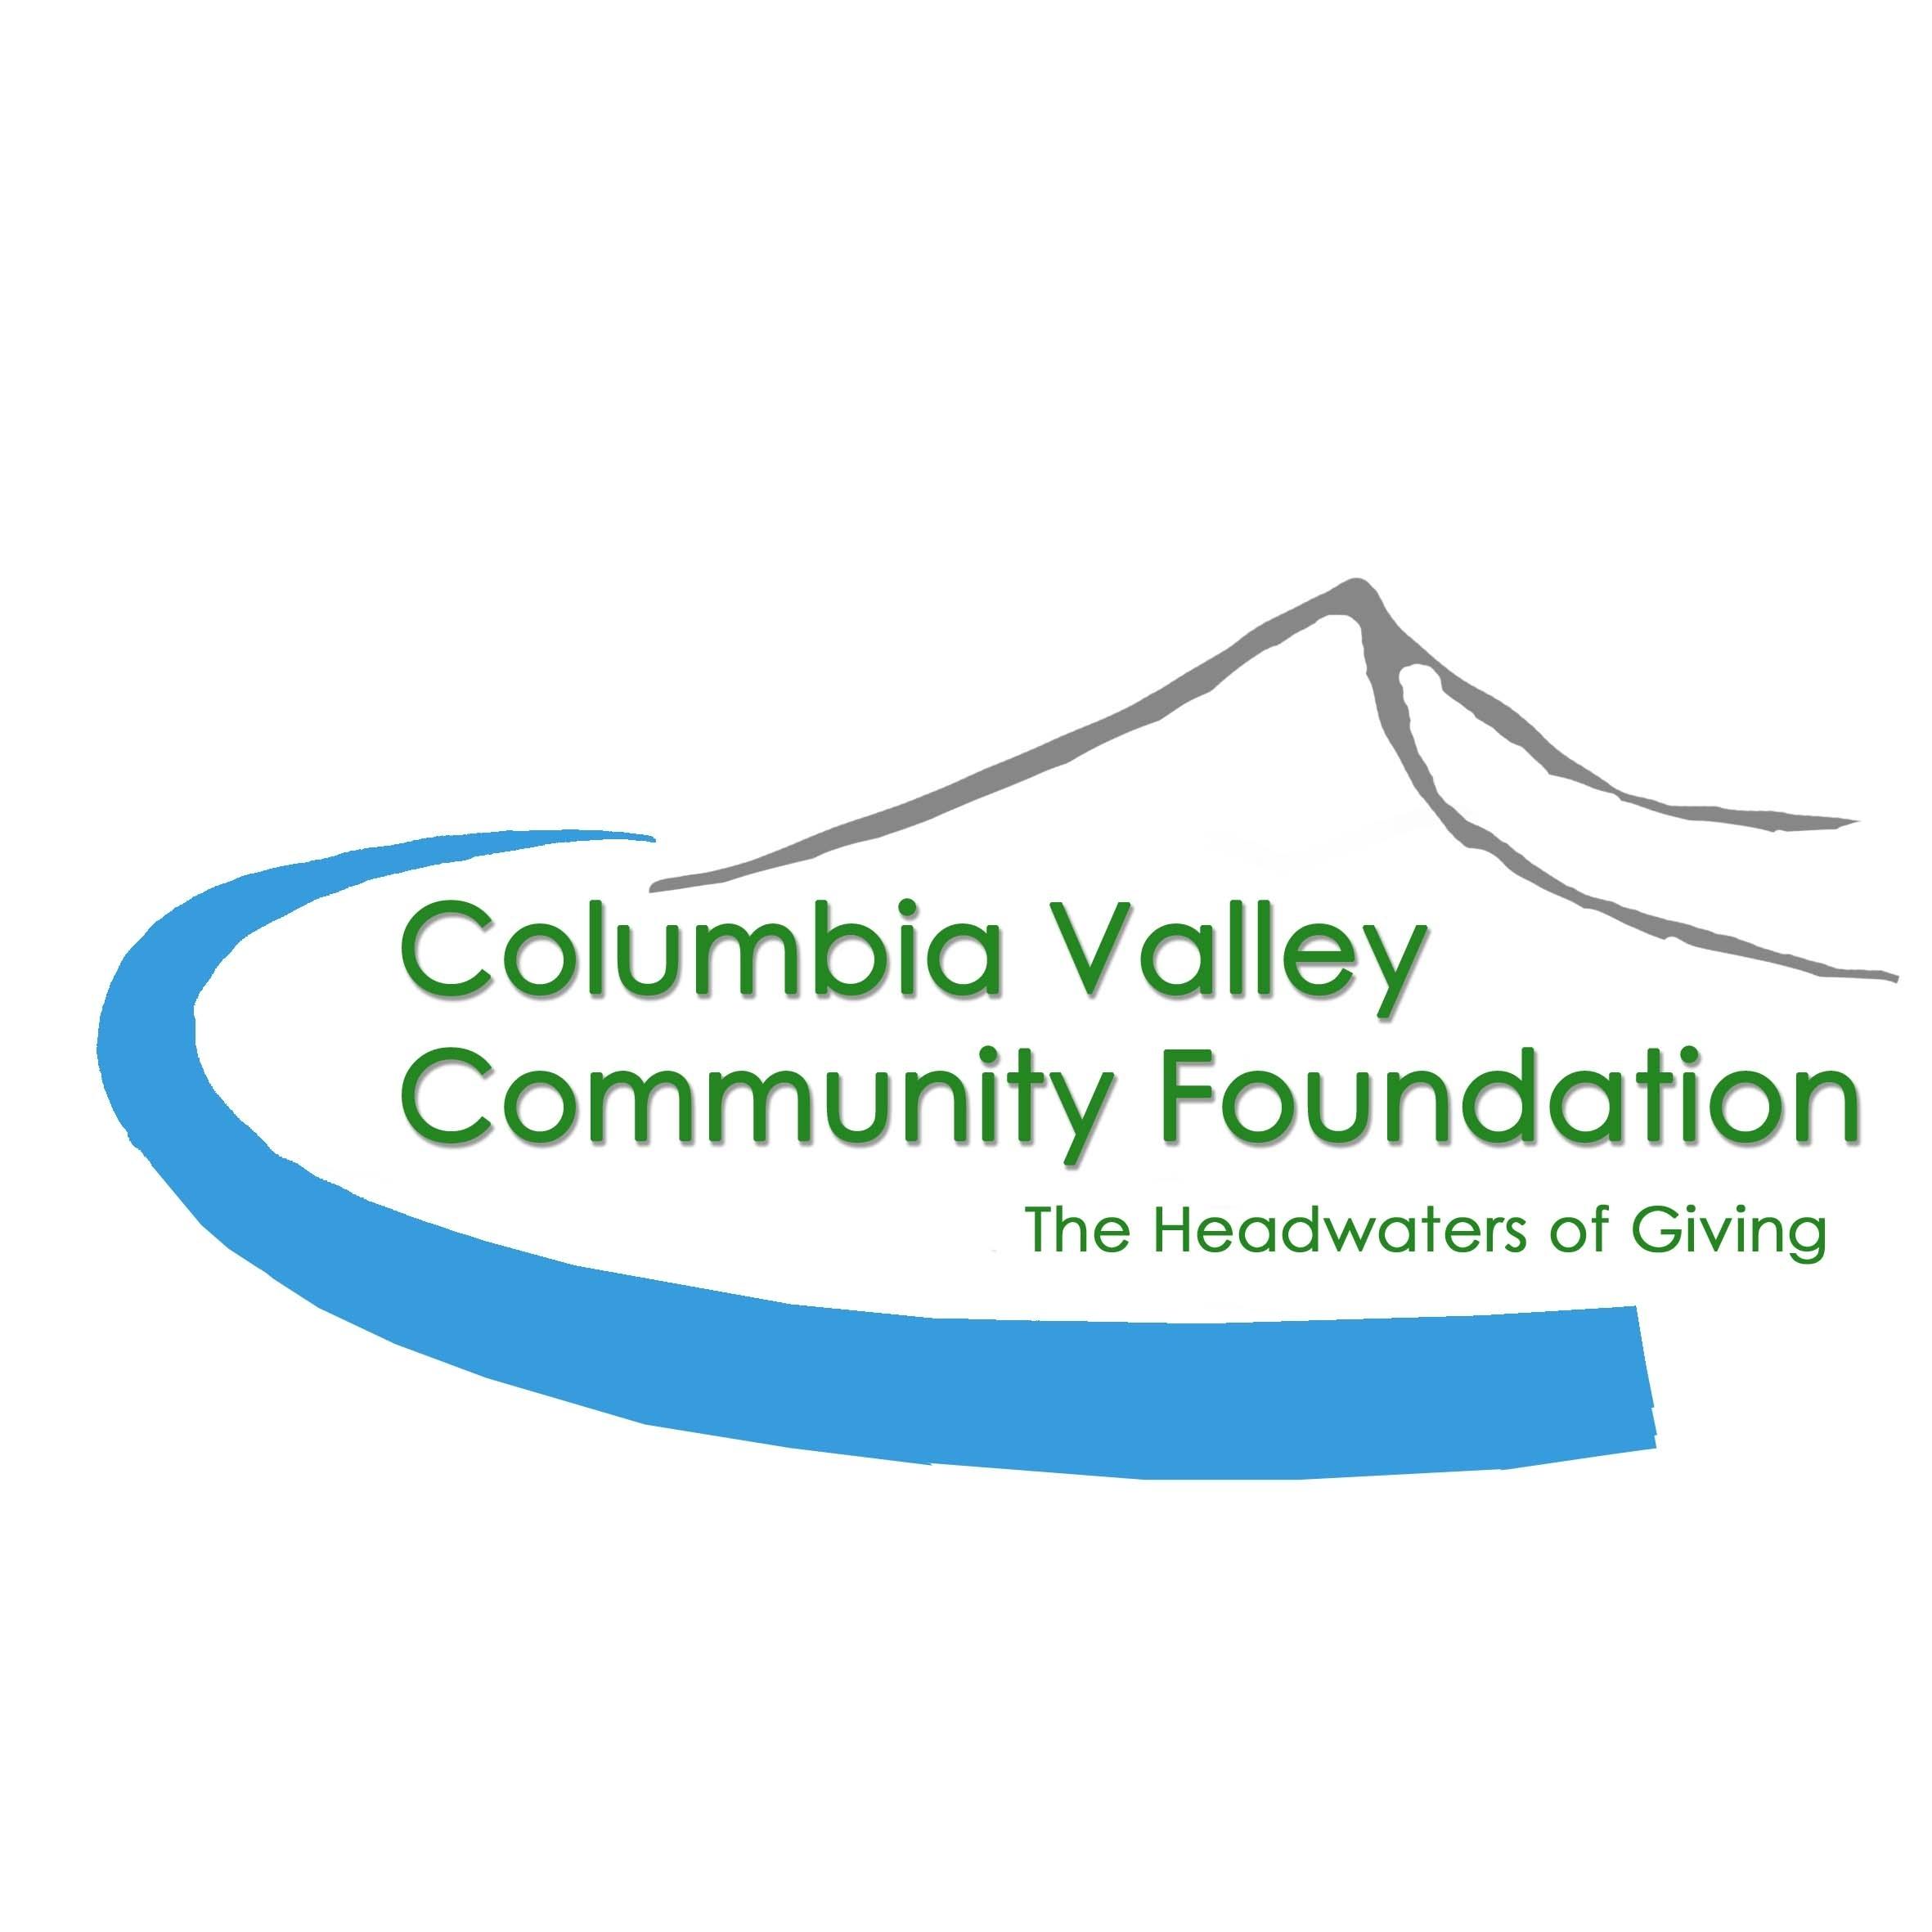 COLUMBIA VALLEY COMMUNITY FOUNDATION